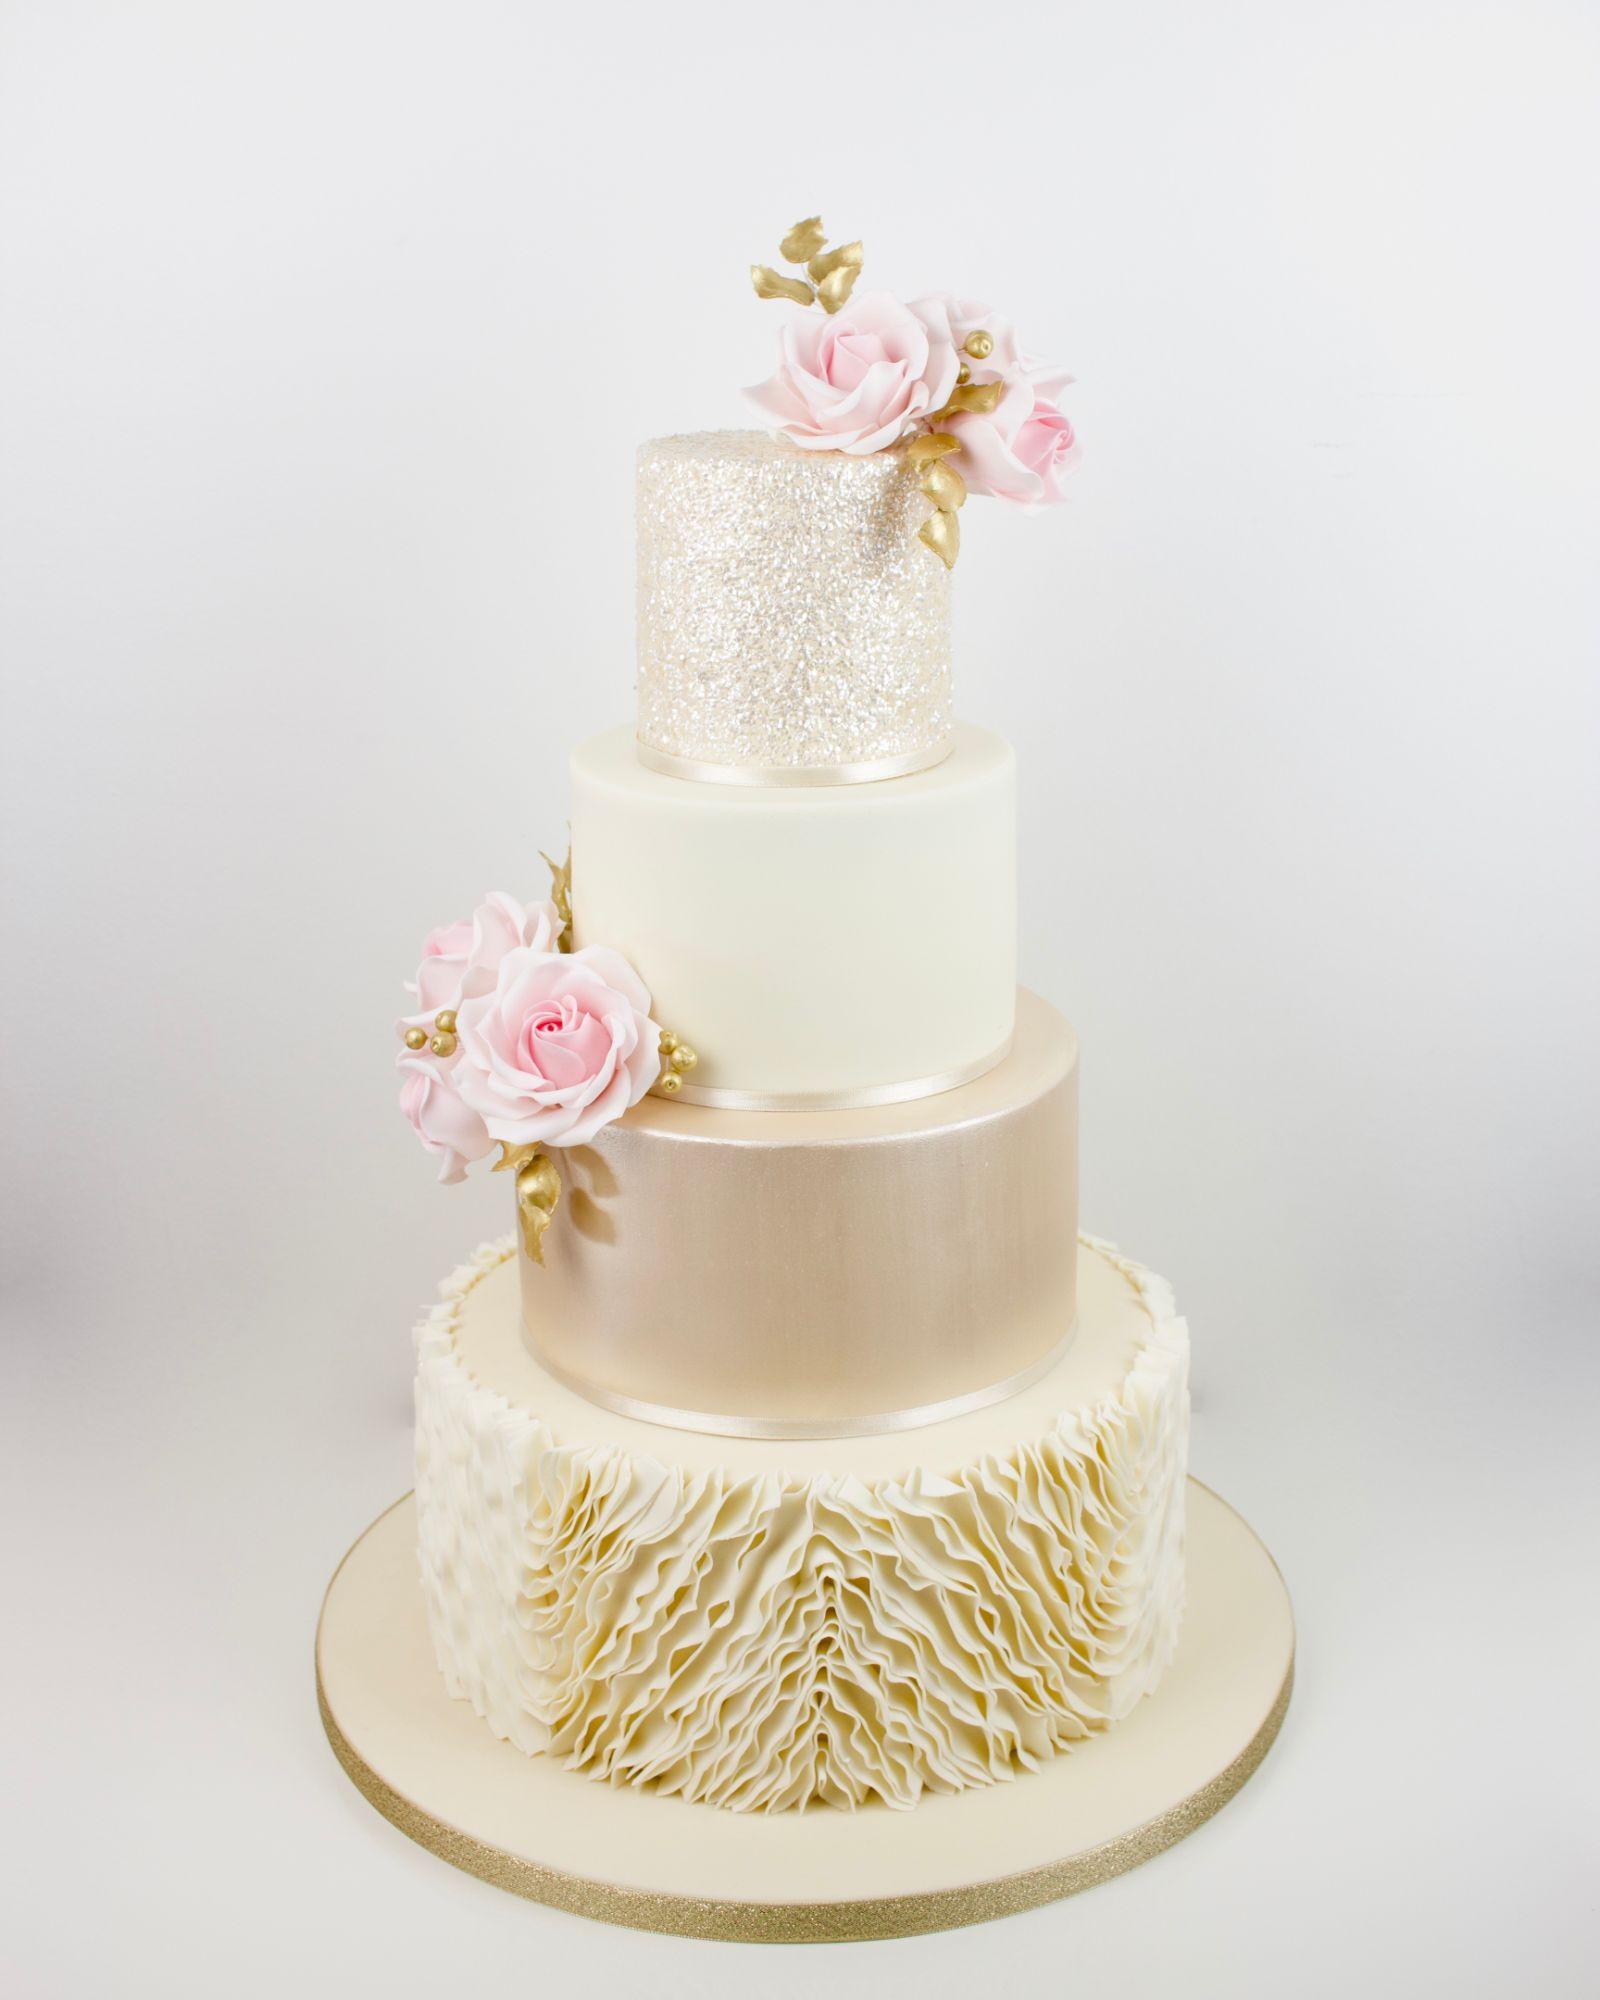 Modern, Ruffles, lustre, gillter  with sugar roses